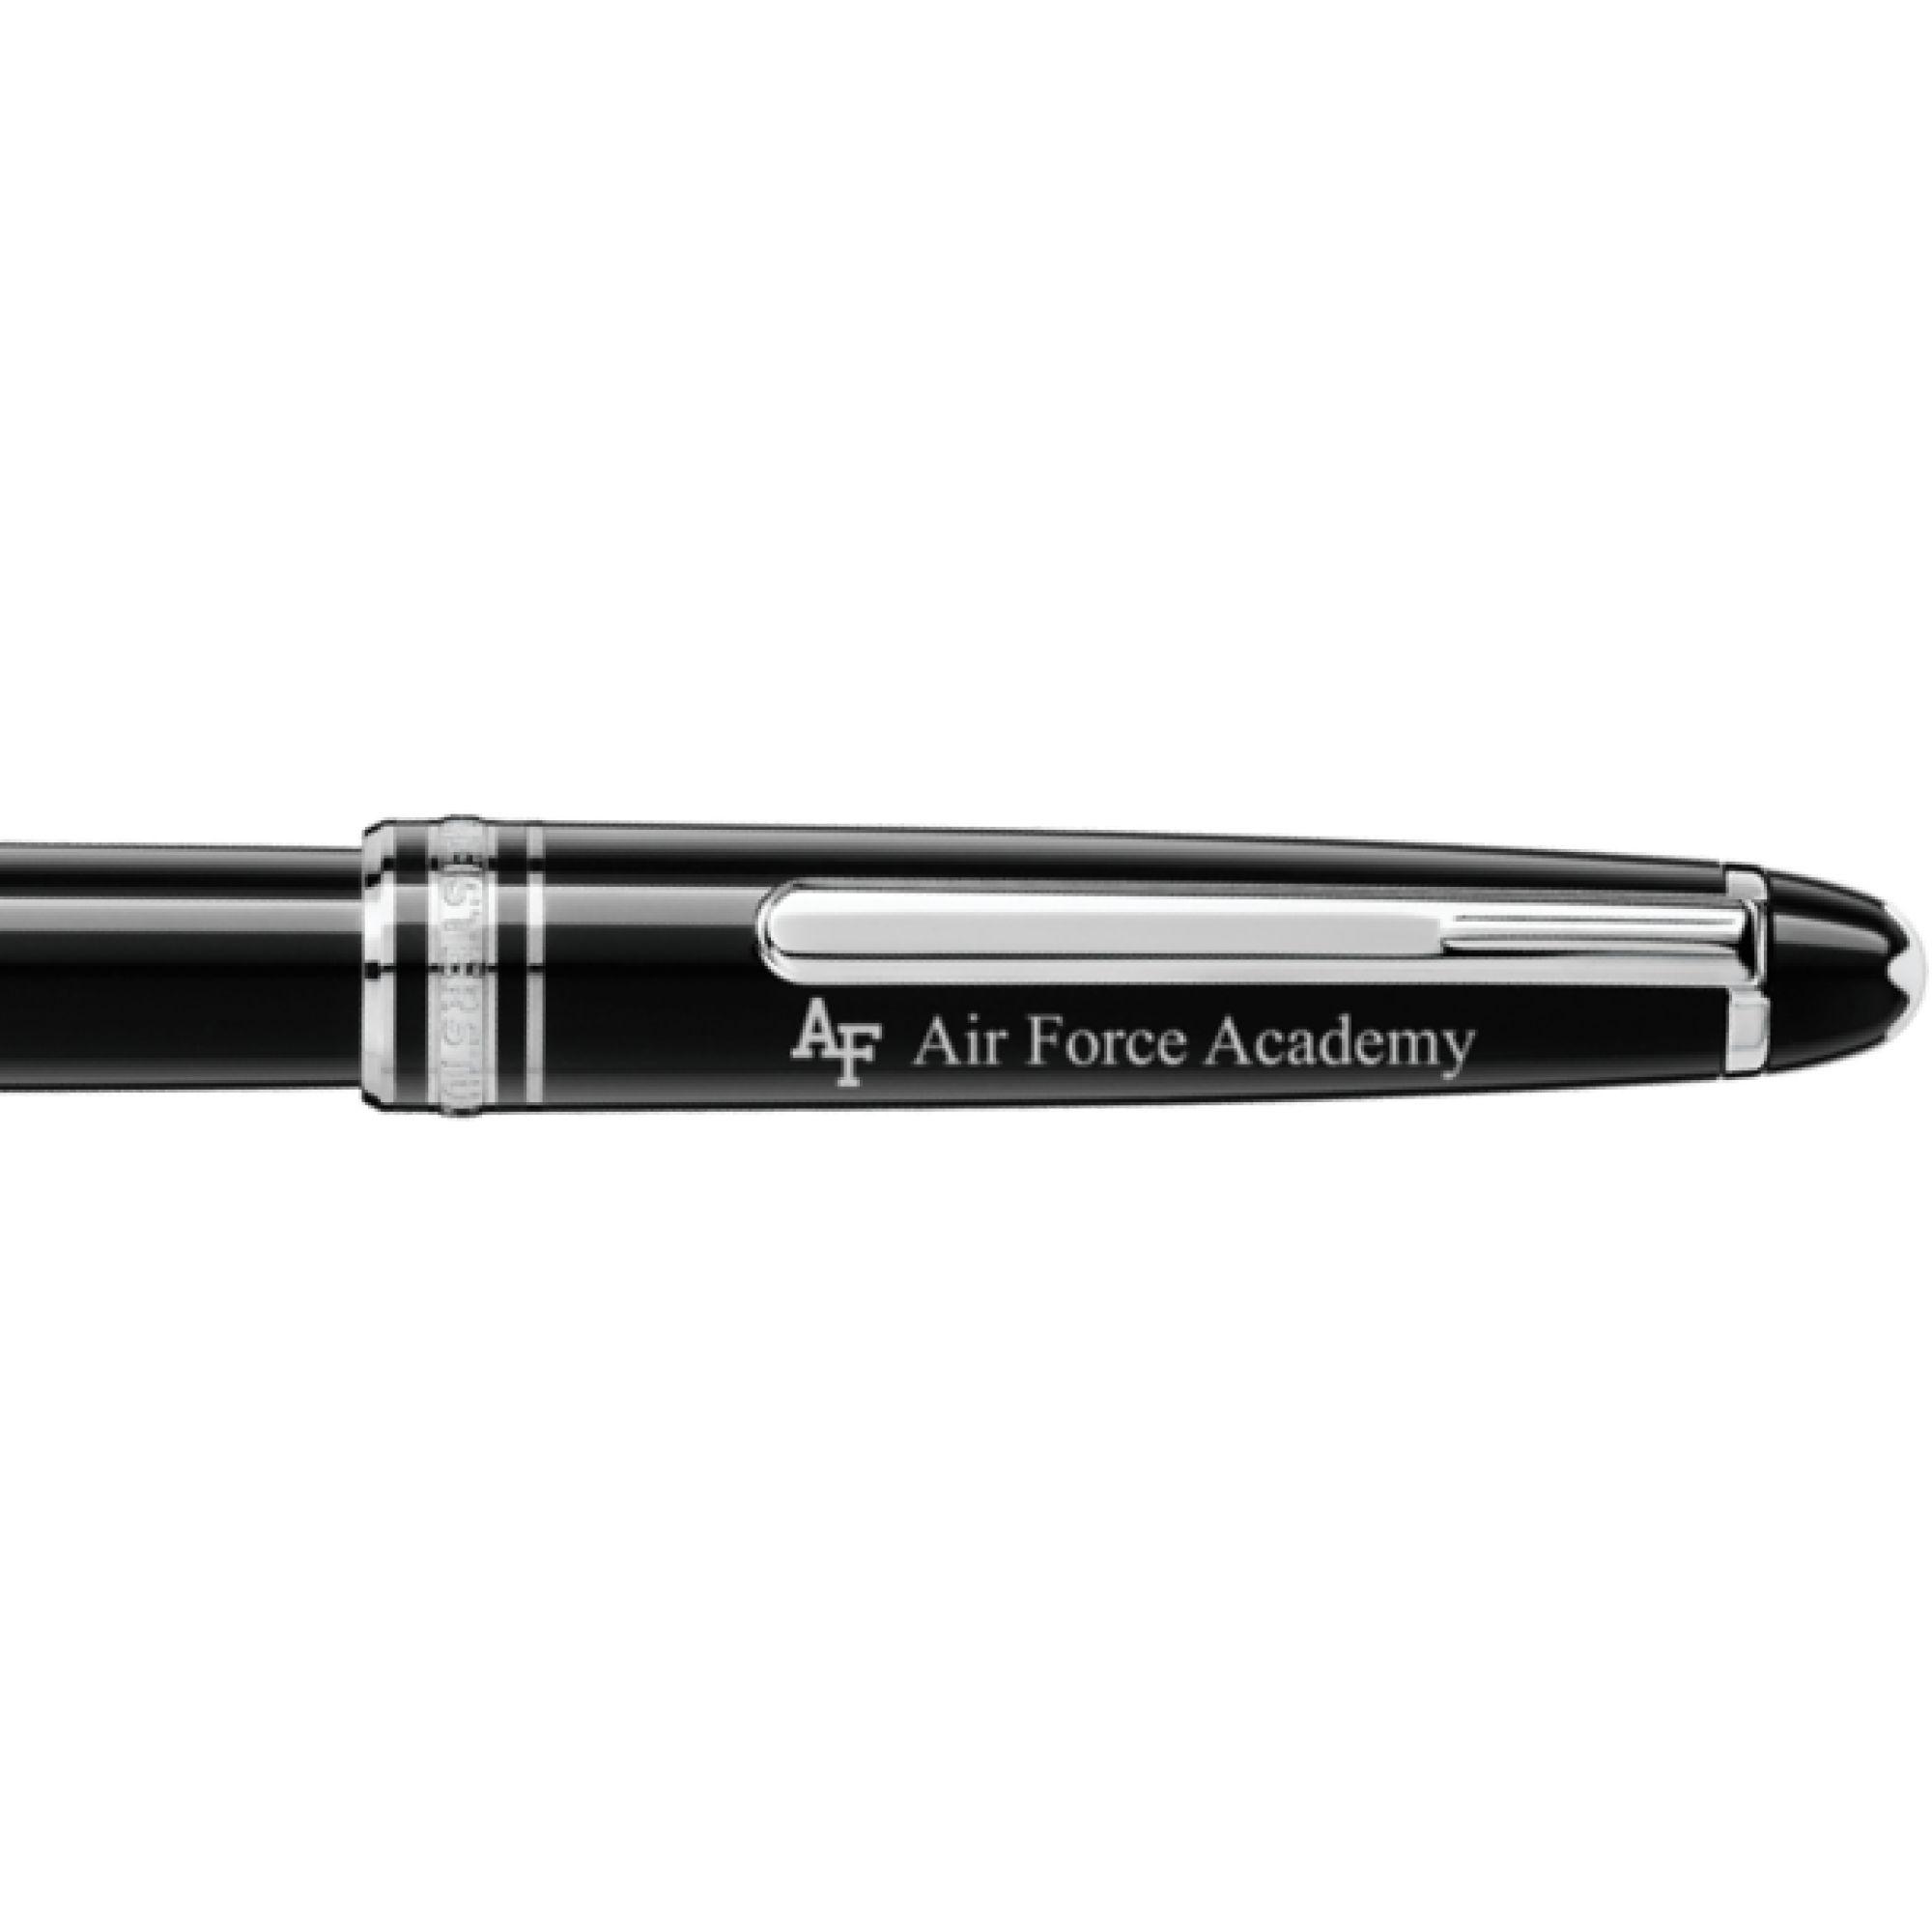 US Air Force Academy Montblanc Meisterstück Classique Rollerball Pen in Platinum